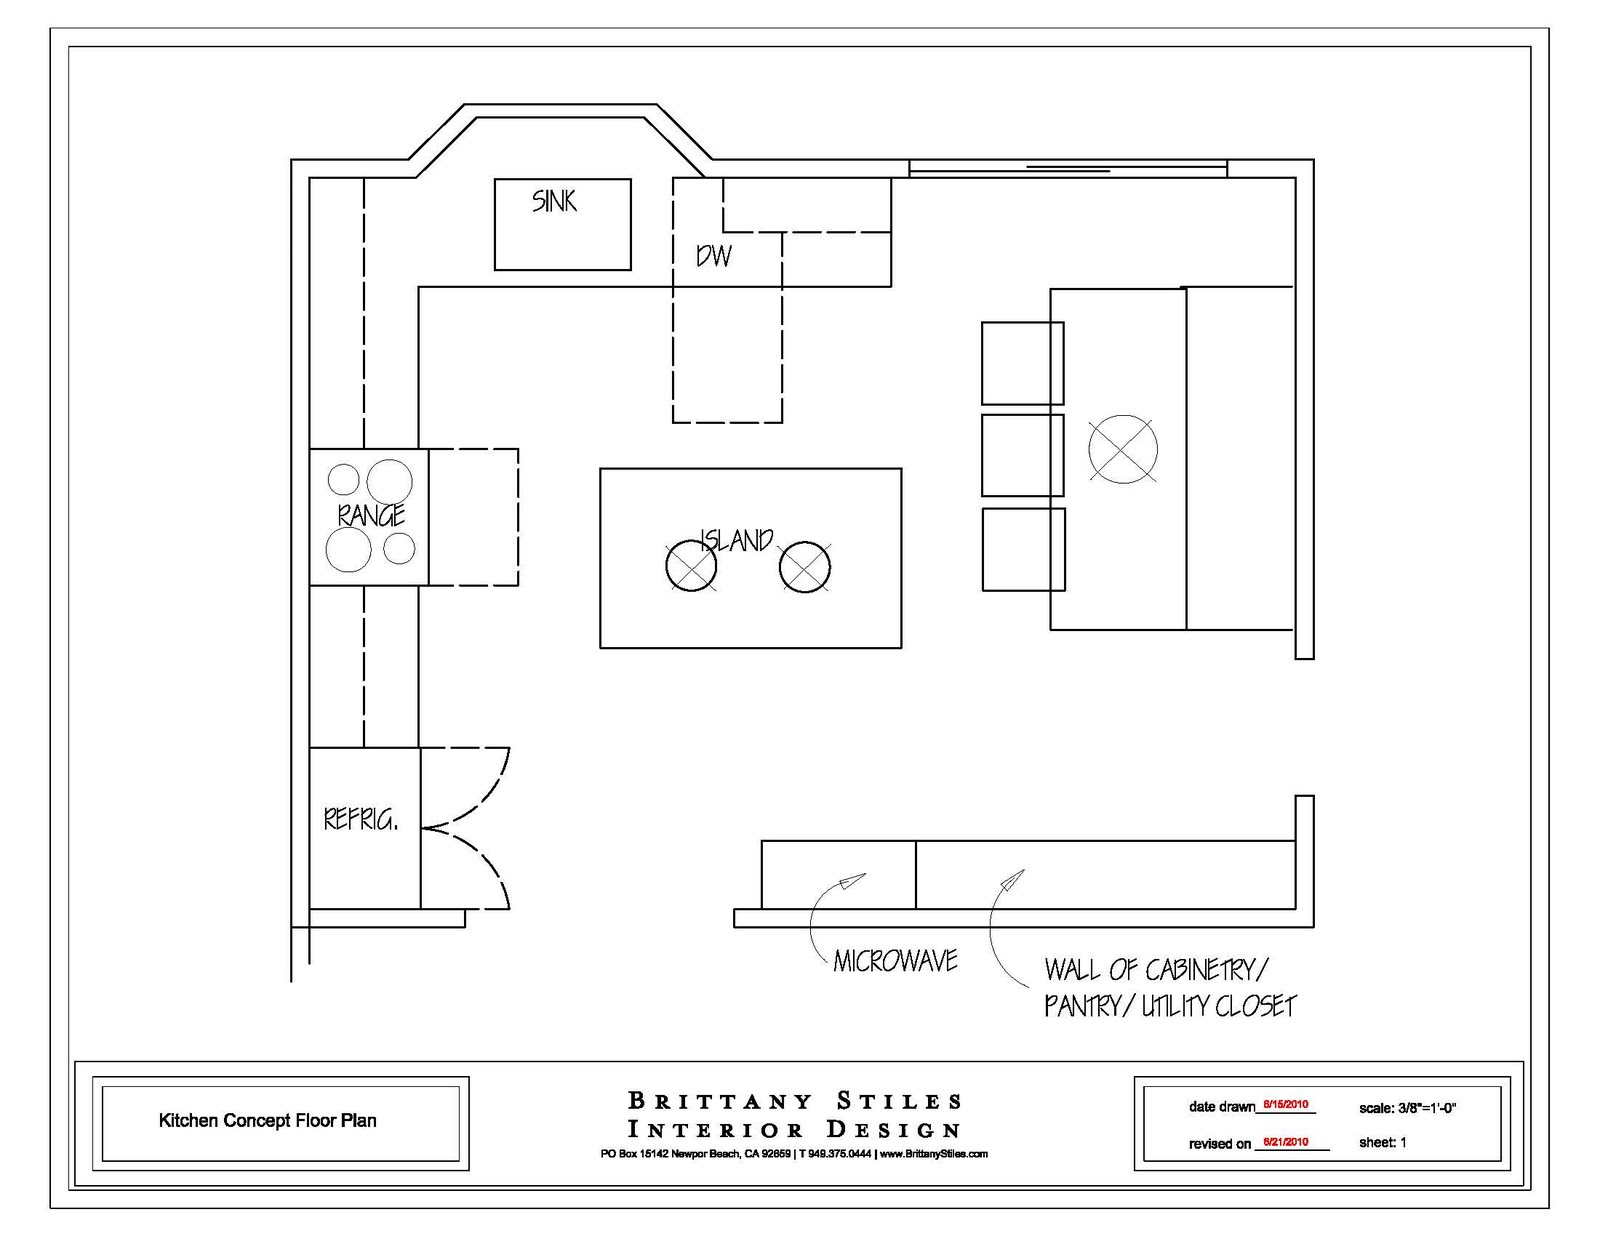 peninsula kitchen layout | decorating ideas